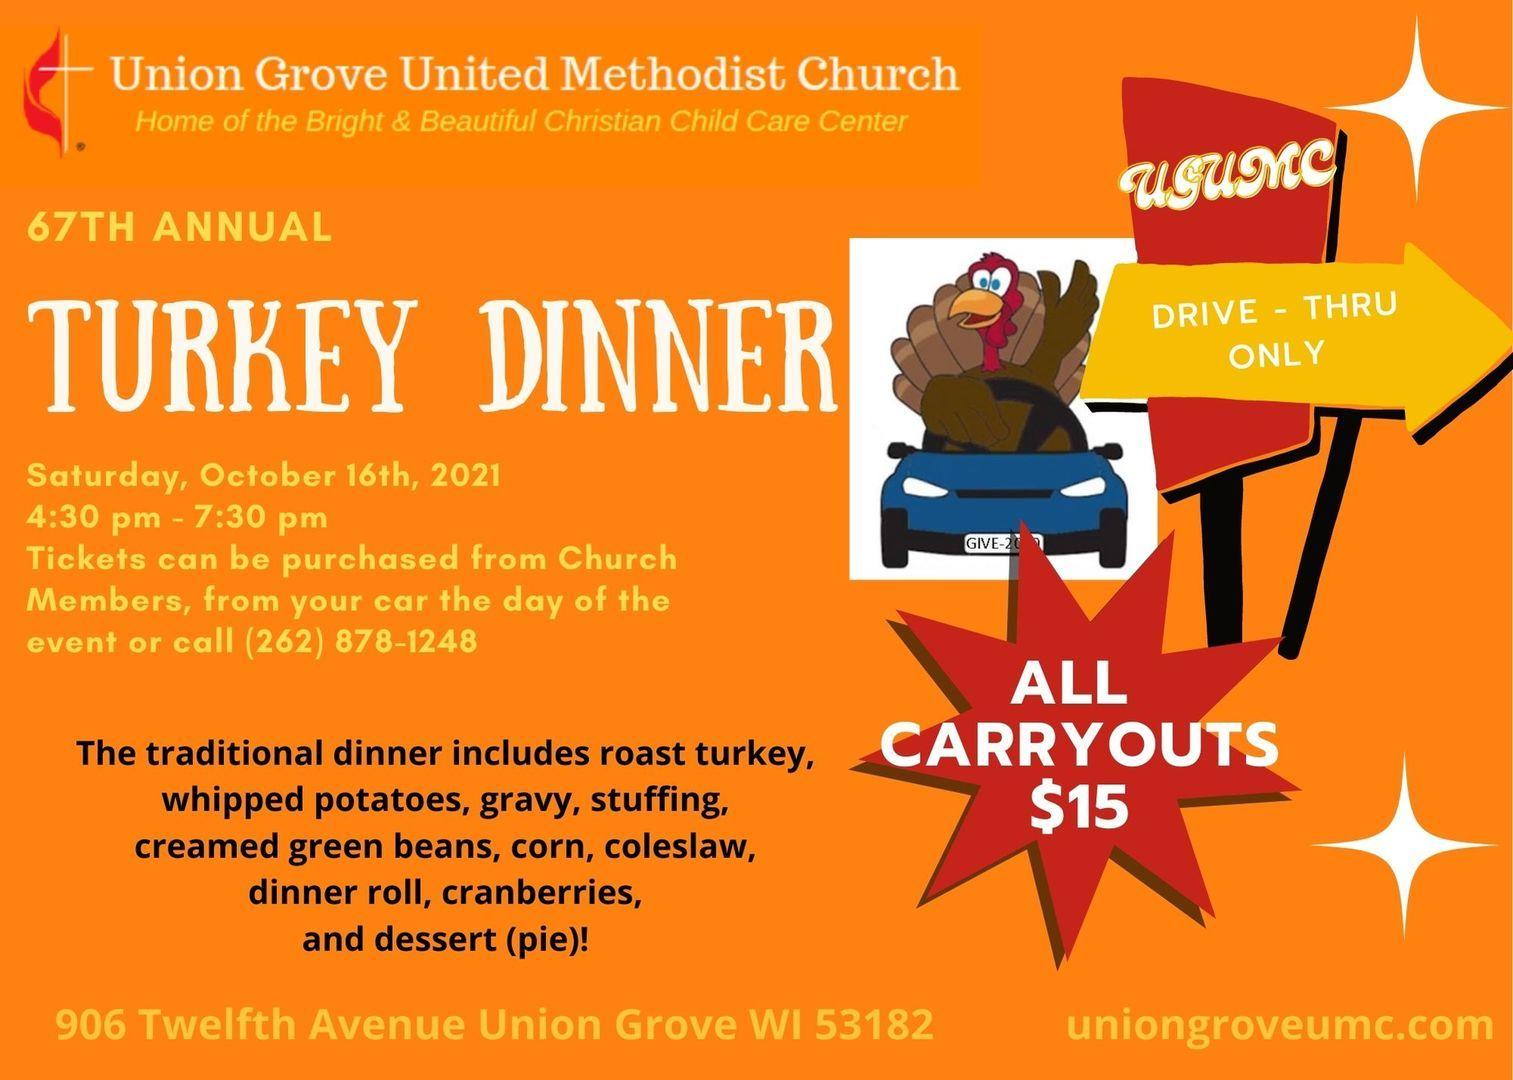 67th Annual Turkey Dinner (DRIVE THRU ONLY)